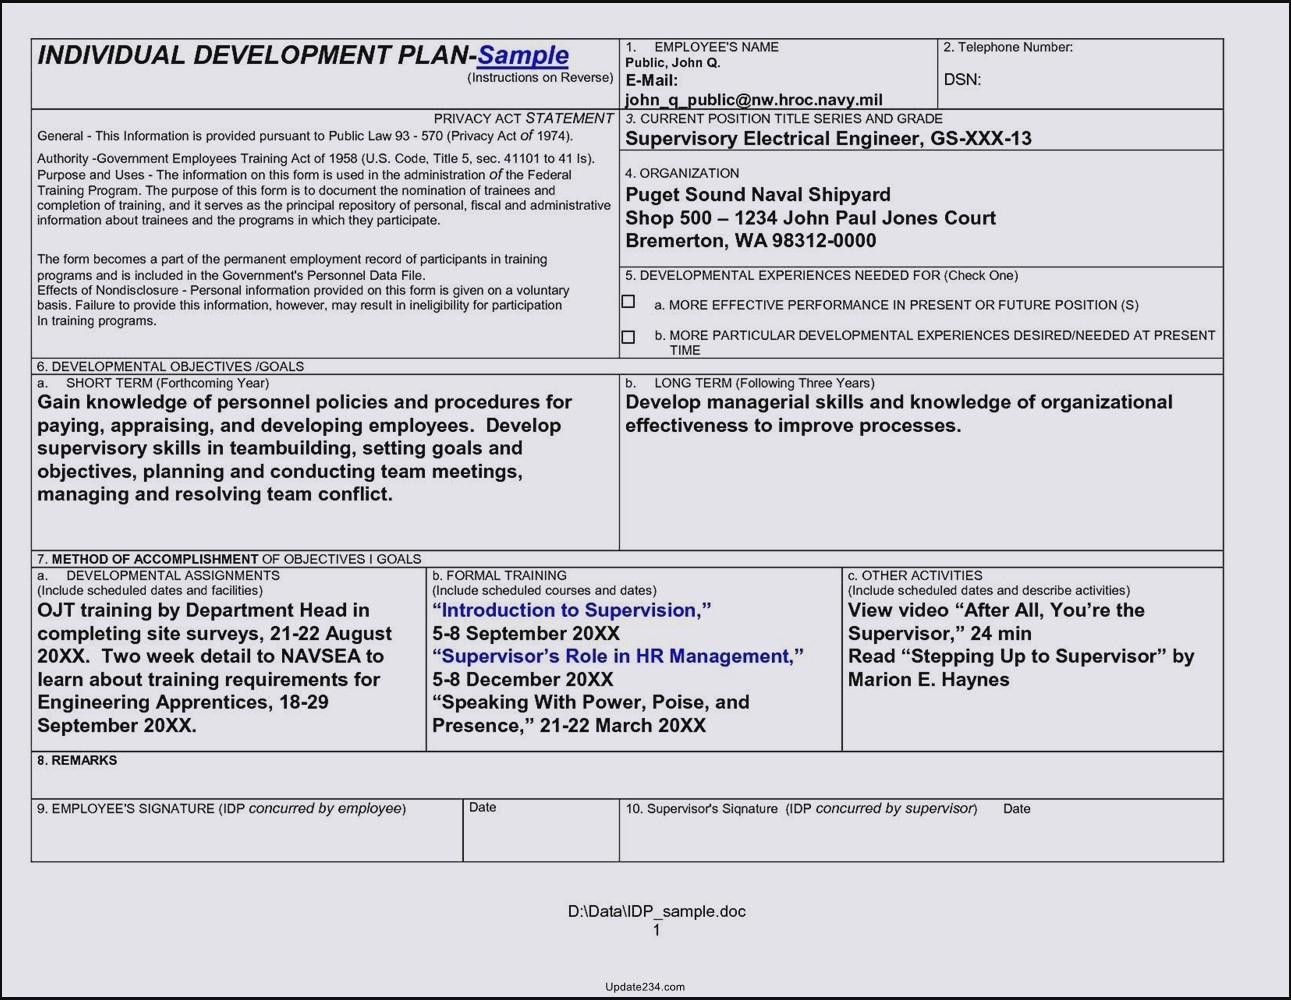 Career Development Plan Template Unique Career Development Plan Template Doc Template Update234